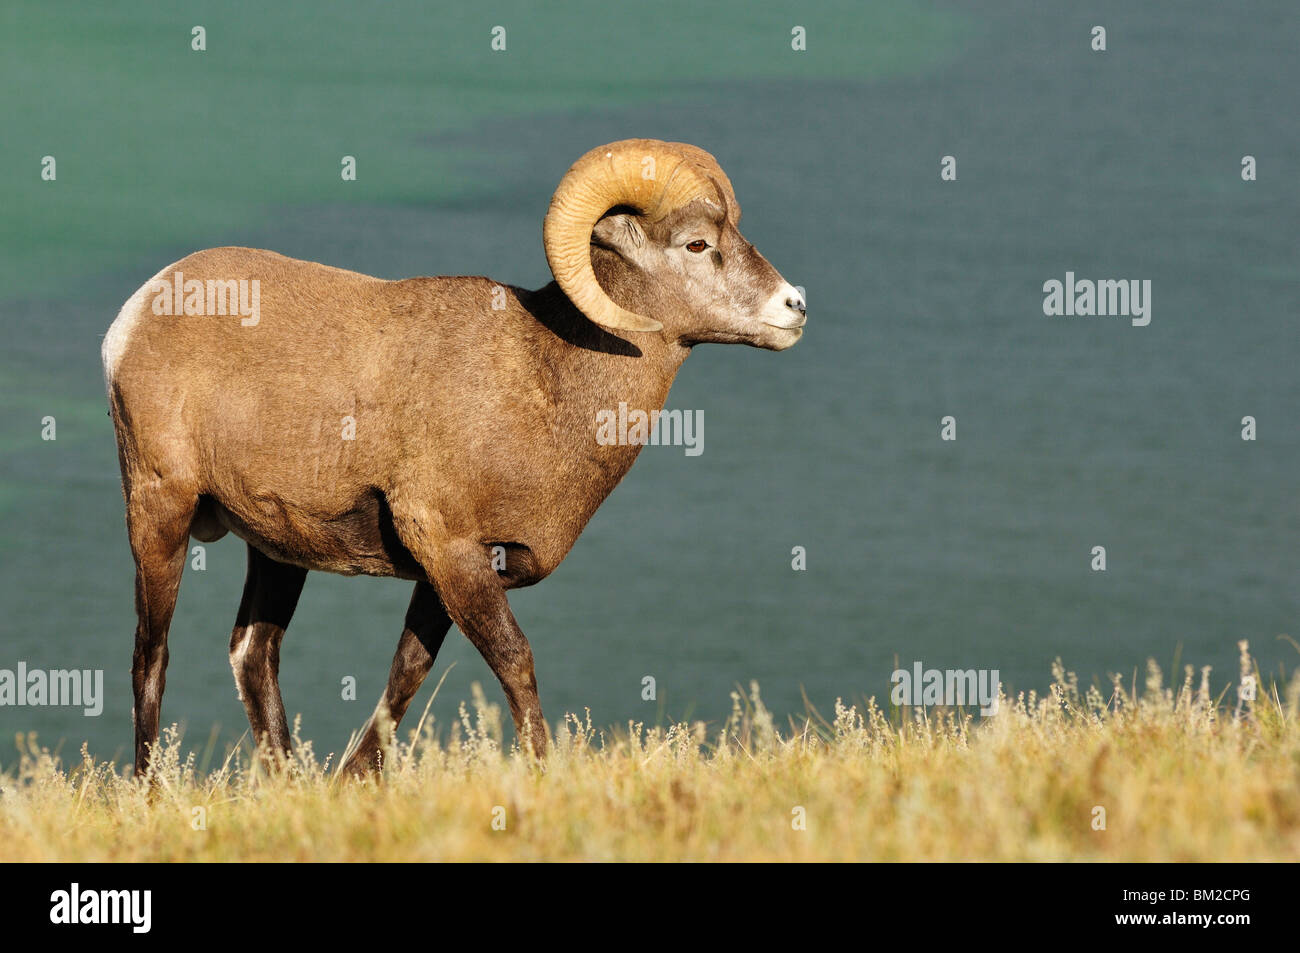 Bighorn Sheep, Jasper National Park, Alberta, Canada - Stock Image